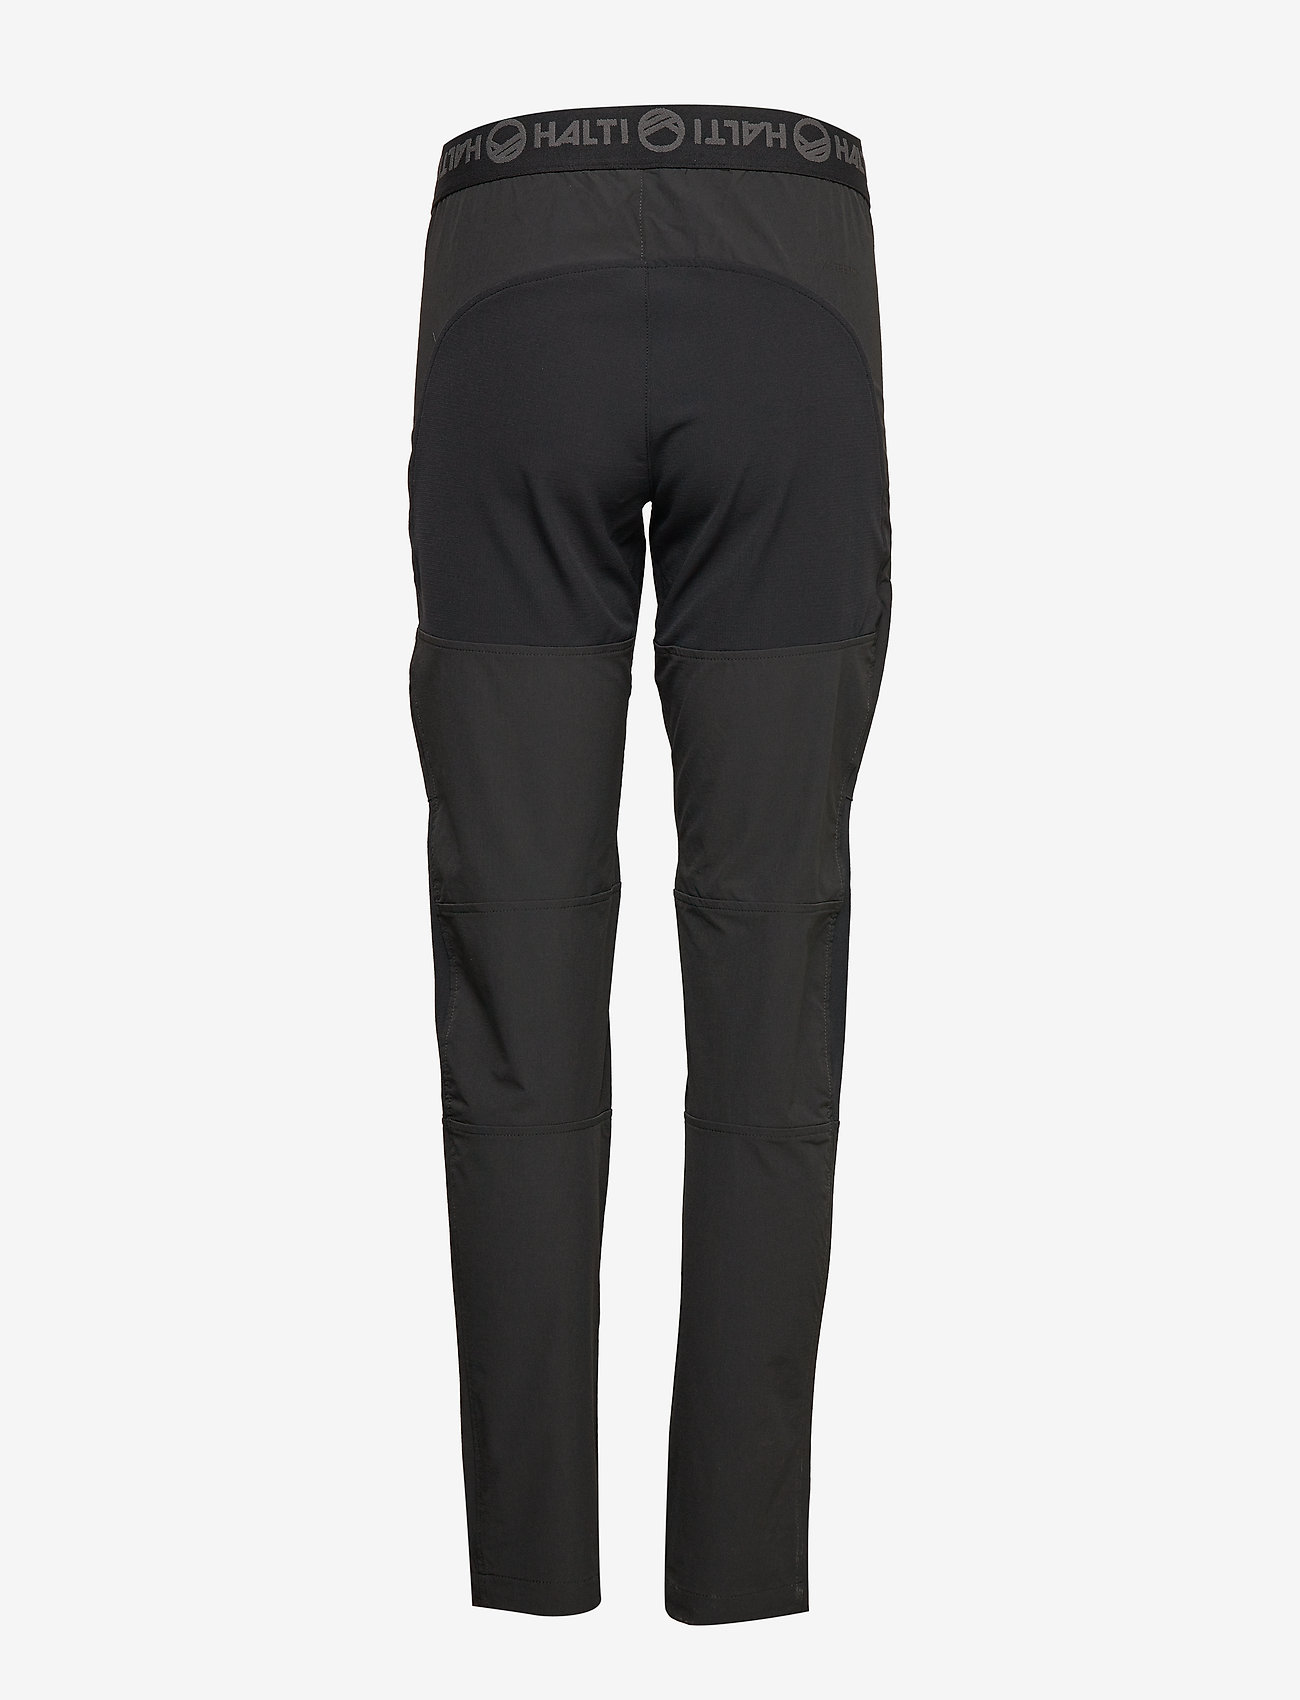 Halti - Pallas Women's X-stretch pants - softshell pants - anthracite grey - 1